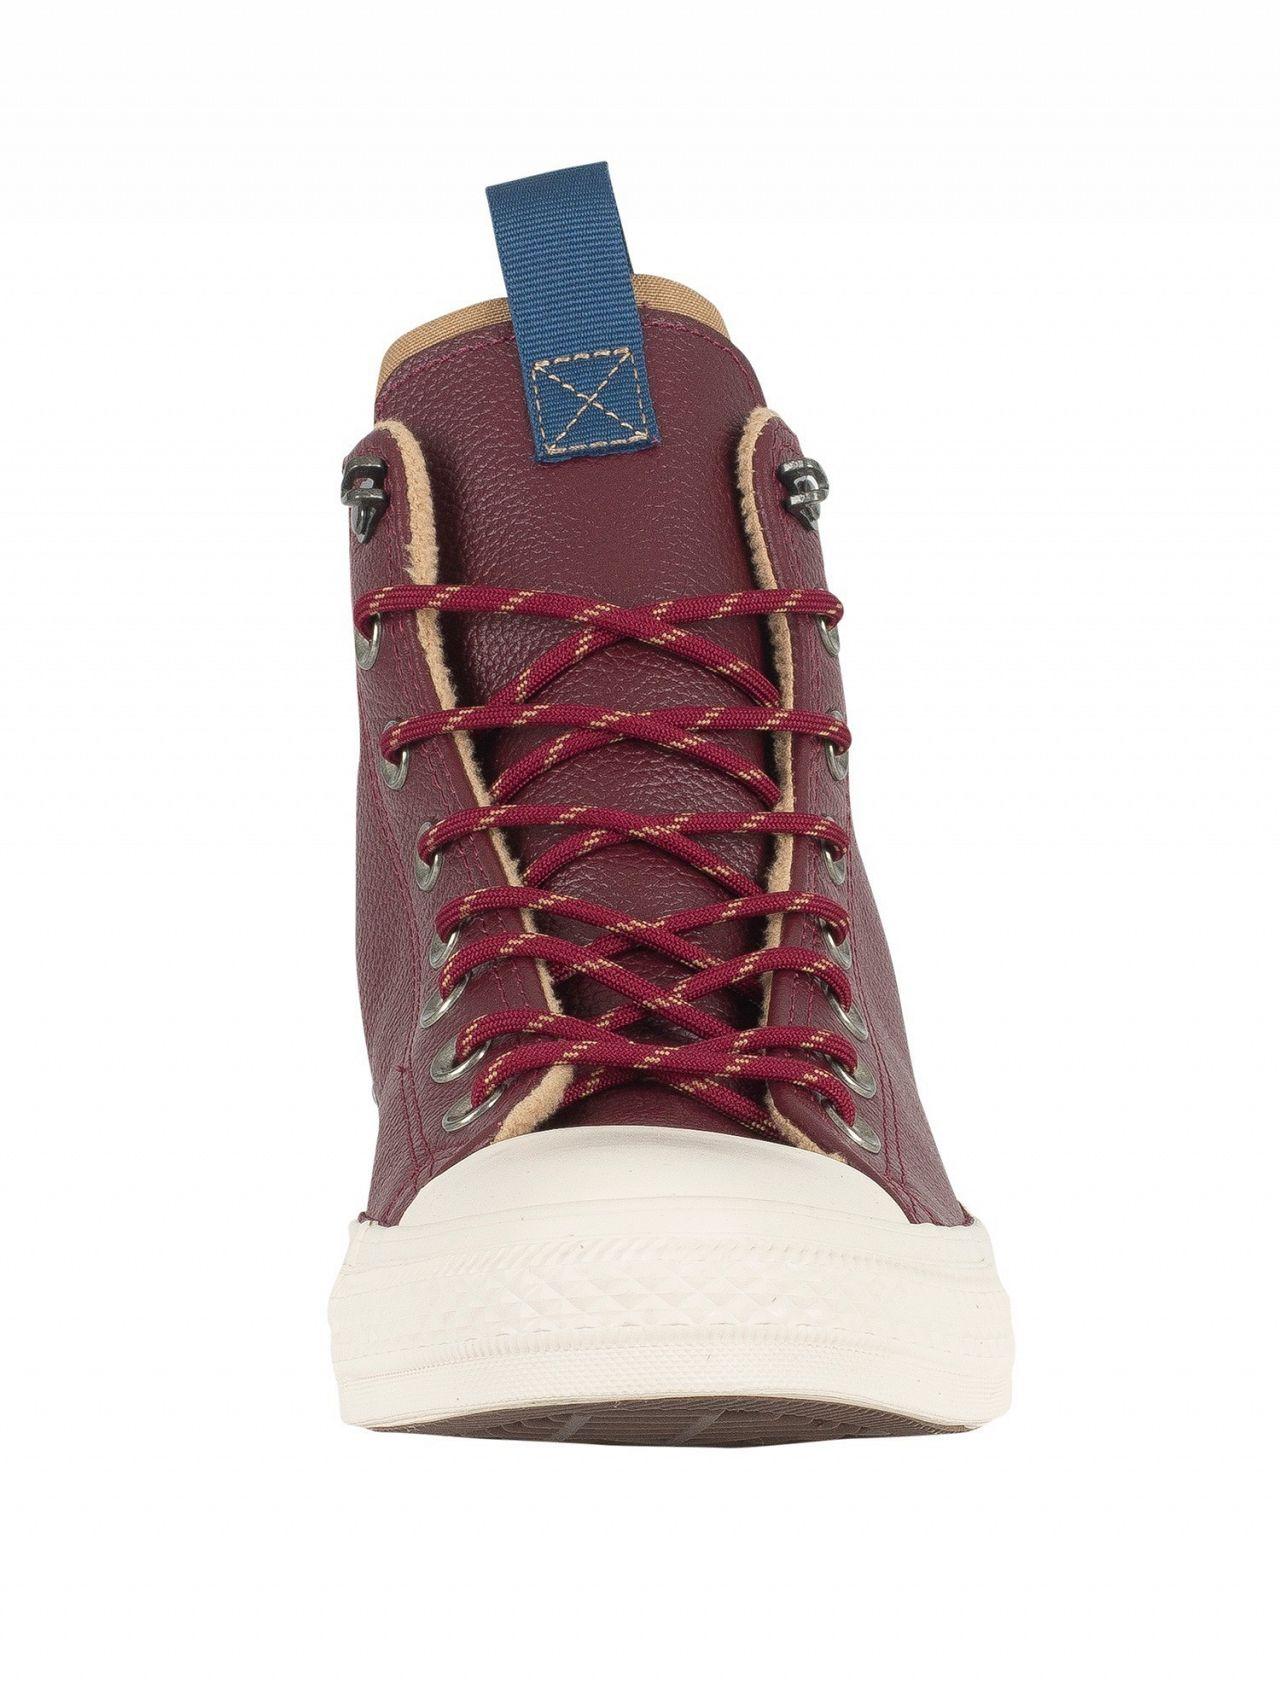 faaa53740c4e Converse Dark Burgundy Teak Driftwood CT All Star Leather Trainers ...